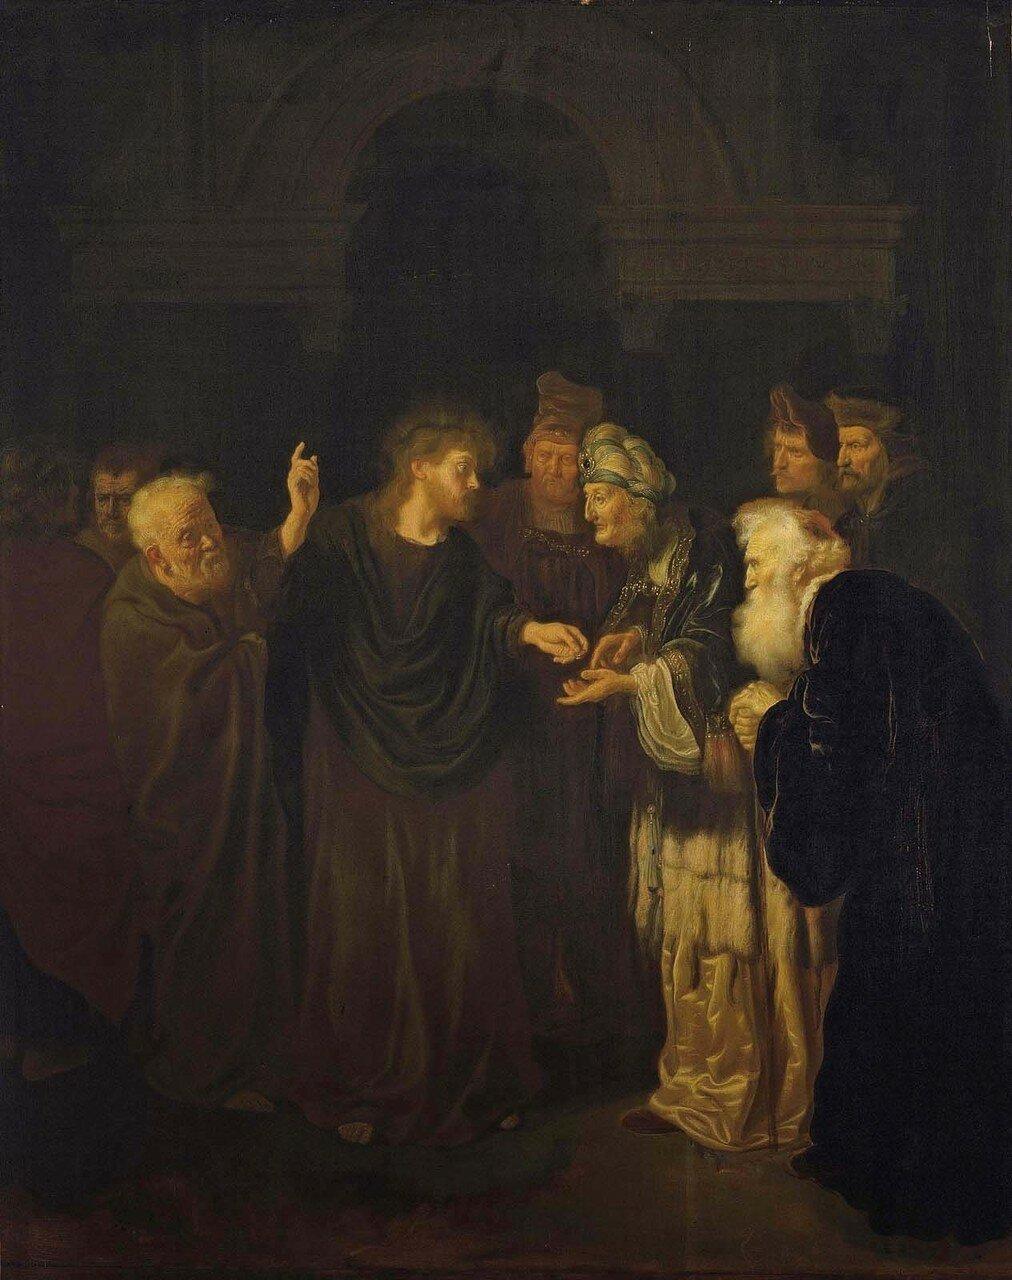 1640_Динарий кесаря (The Tribute Money)_106.5 х 84.5_д.,м._Частное собрание.jpg